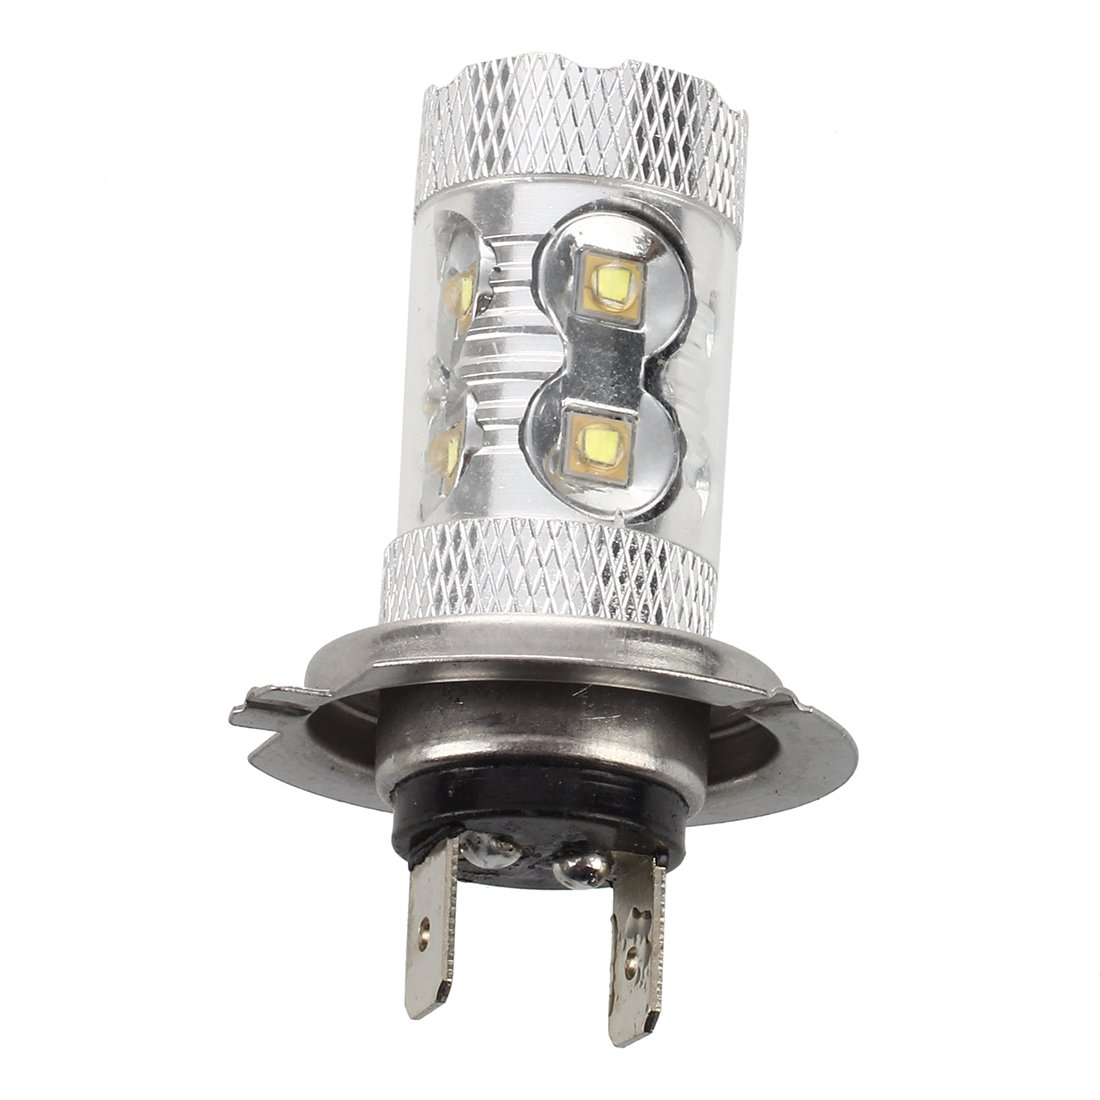 faro auto - SODIAL(R)Lampada 50w h7 472 Led White 6500k Lampadina Auto Headlight